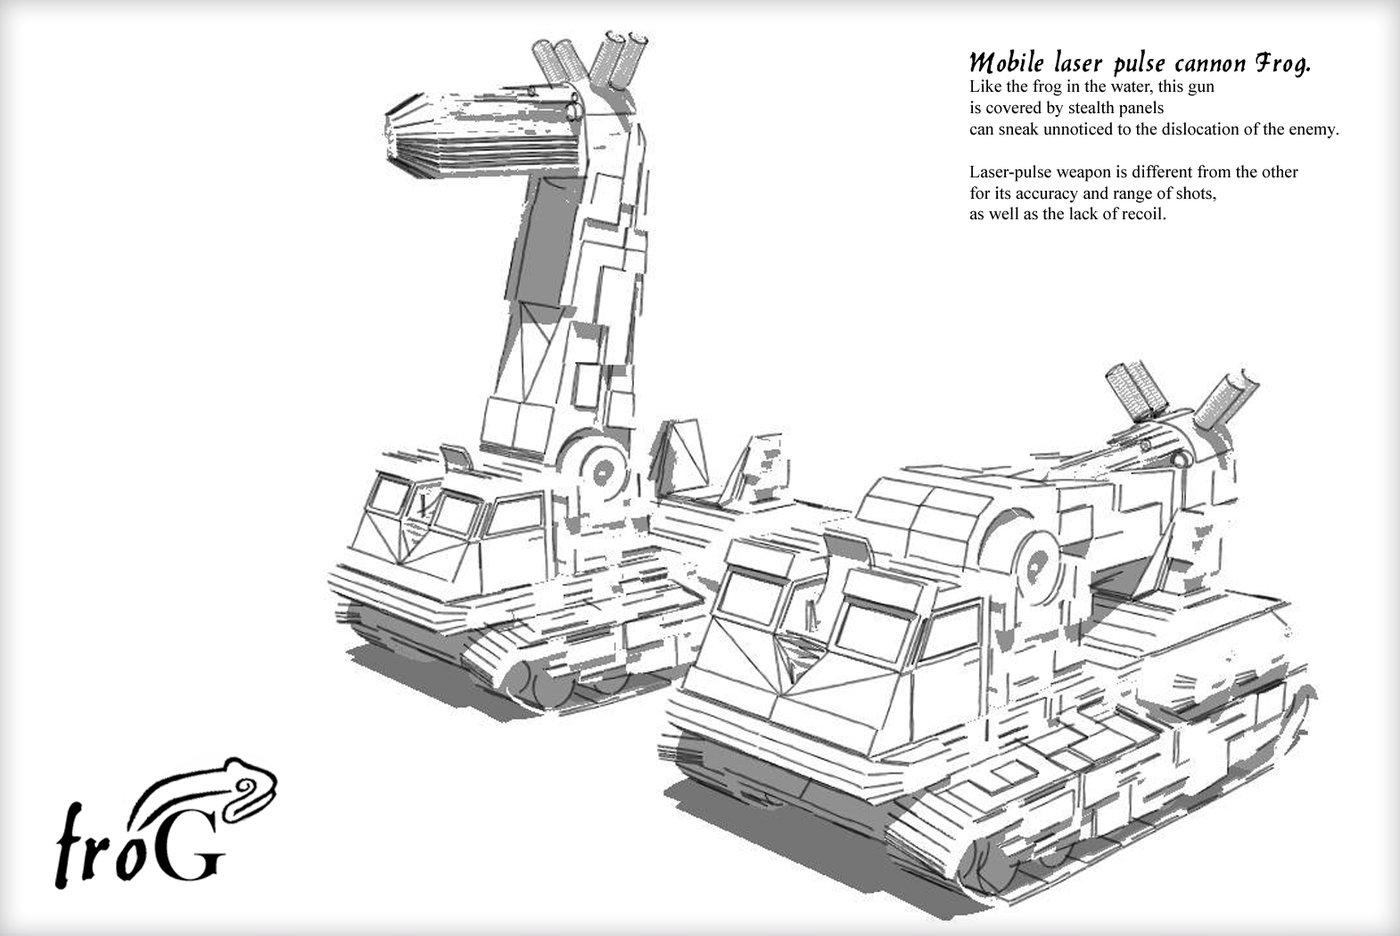 Concepts By Anton Shabramov At Coroflot